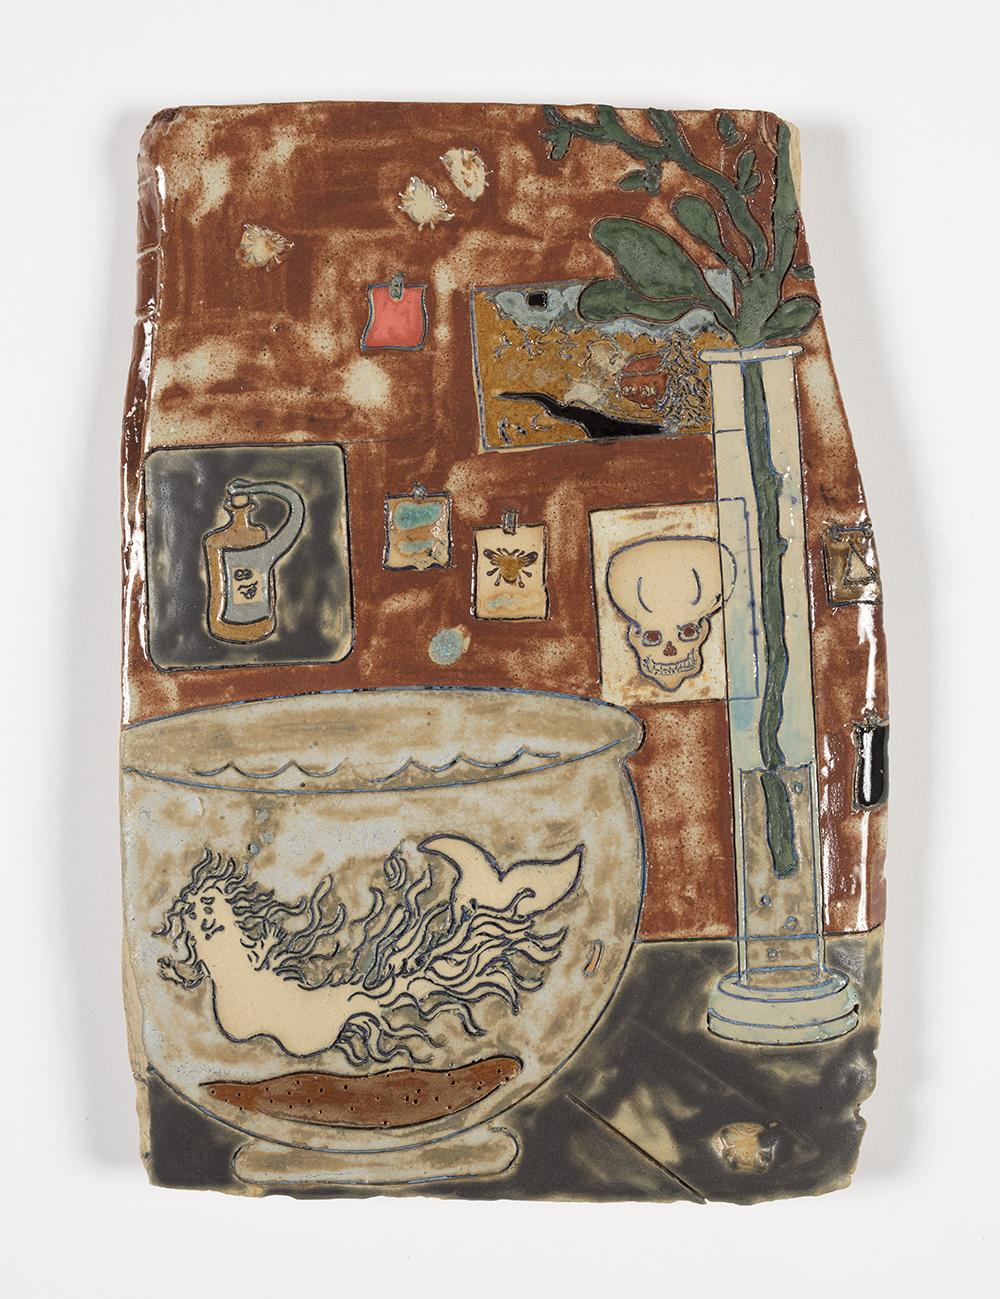 Kevin McNamee-Tweed.<em> Place</em>, 2019. Glazed ceramic, 12 x 8 1/2 inches (30.5 x 21.6 cm)